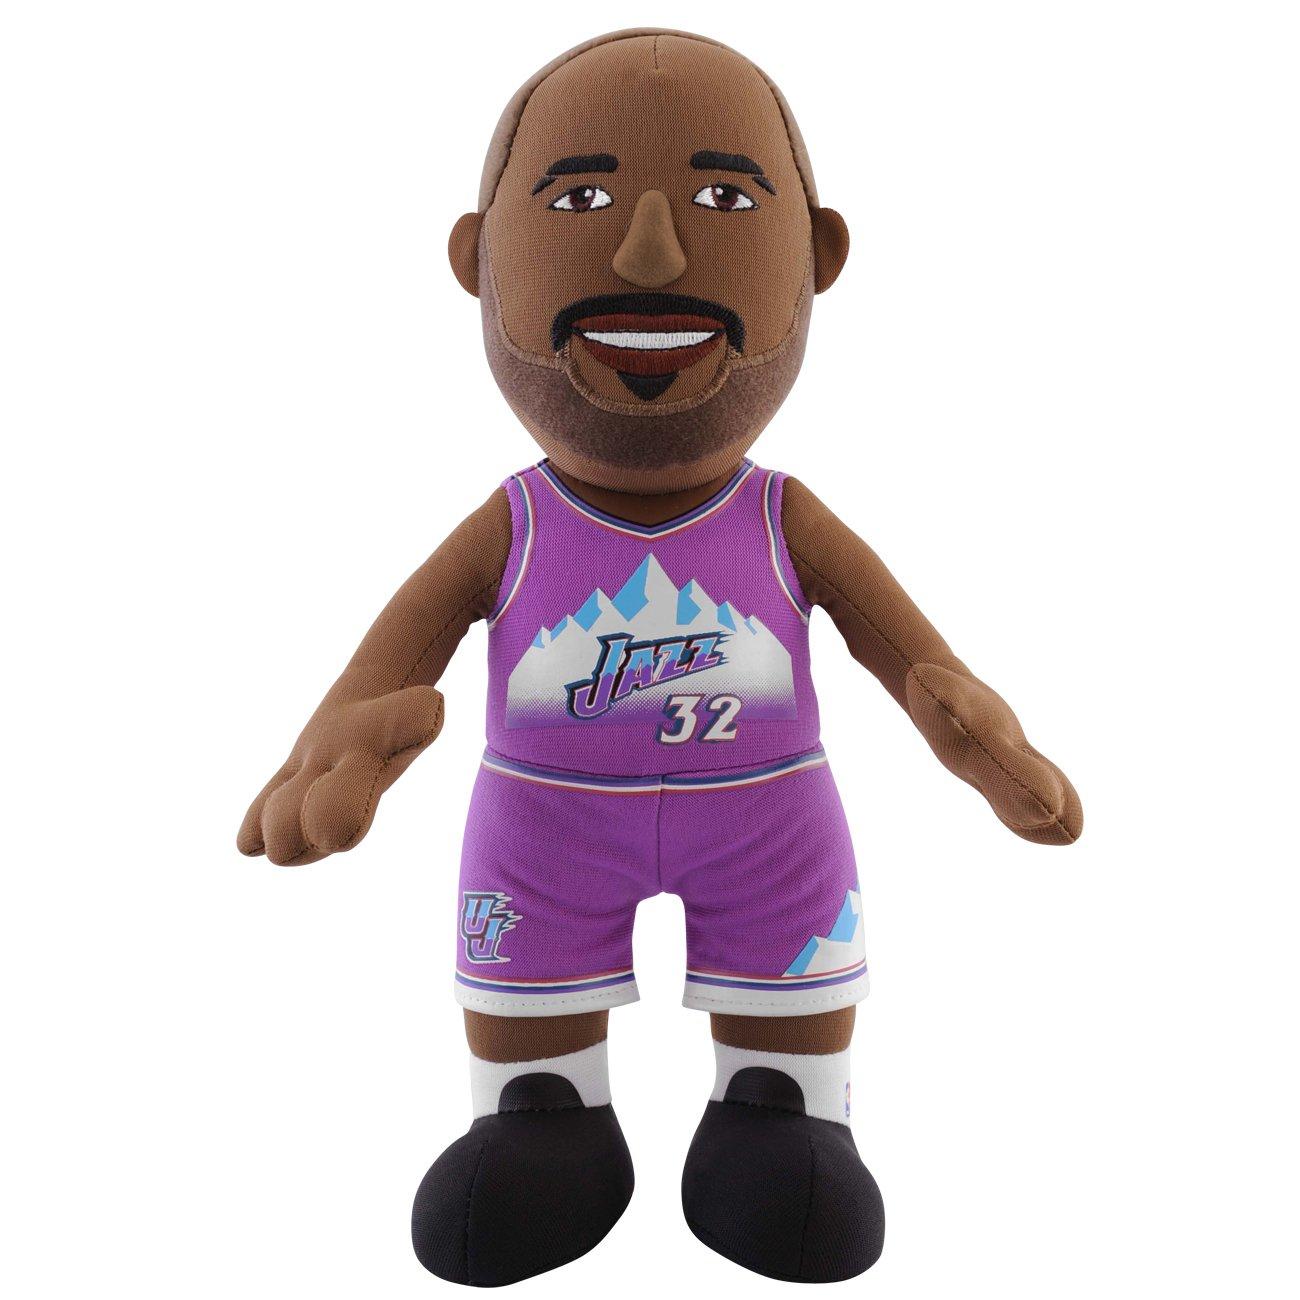 NBA Utah Jazz Karl Malone Player Plush Doll, 6.5-Inch x 3.5-Inch x 10-Inch, Blue